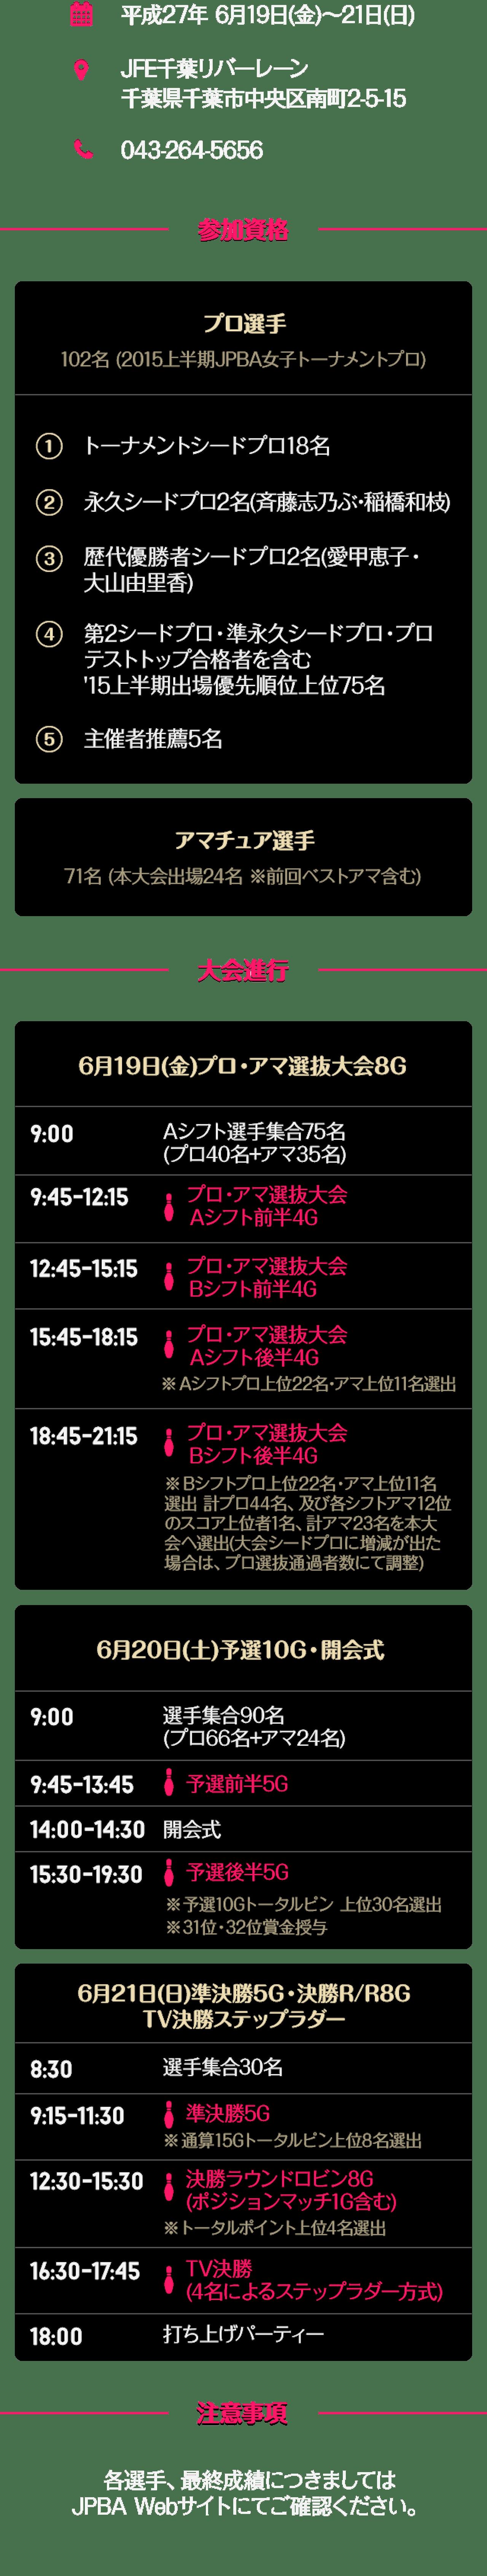 2015 千葉女子オープン 大会概要